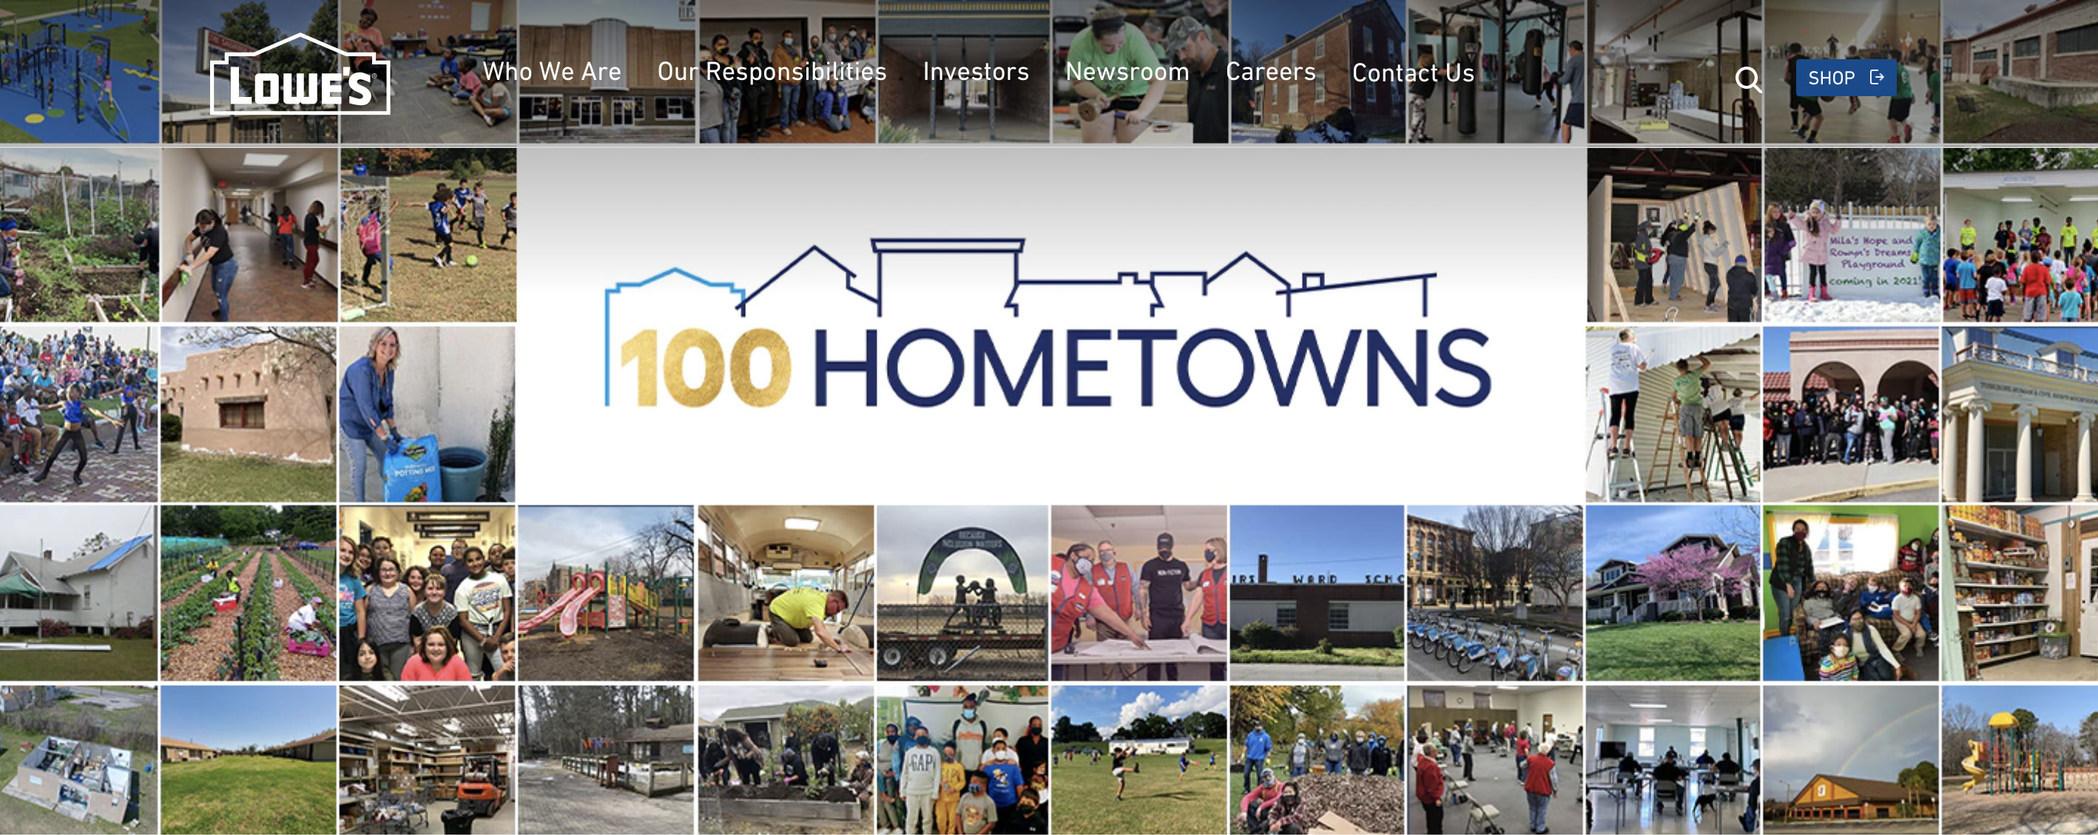 Austin Child Guidance Center named as 100 Hometowns Grant Recipient